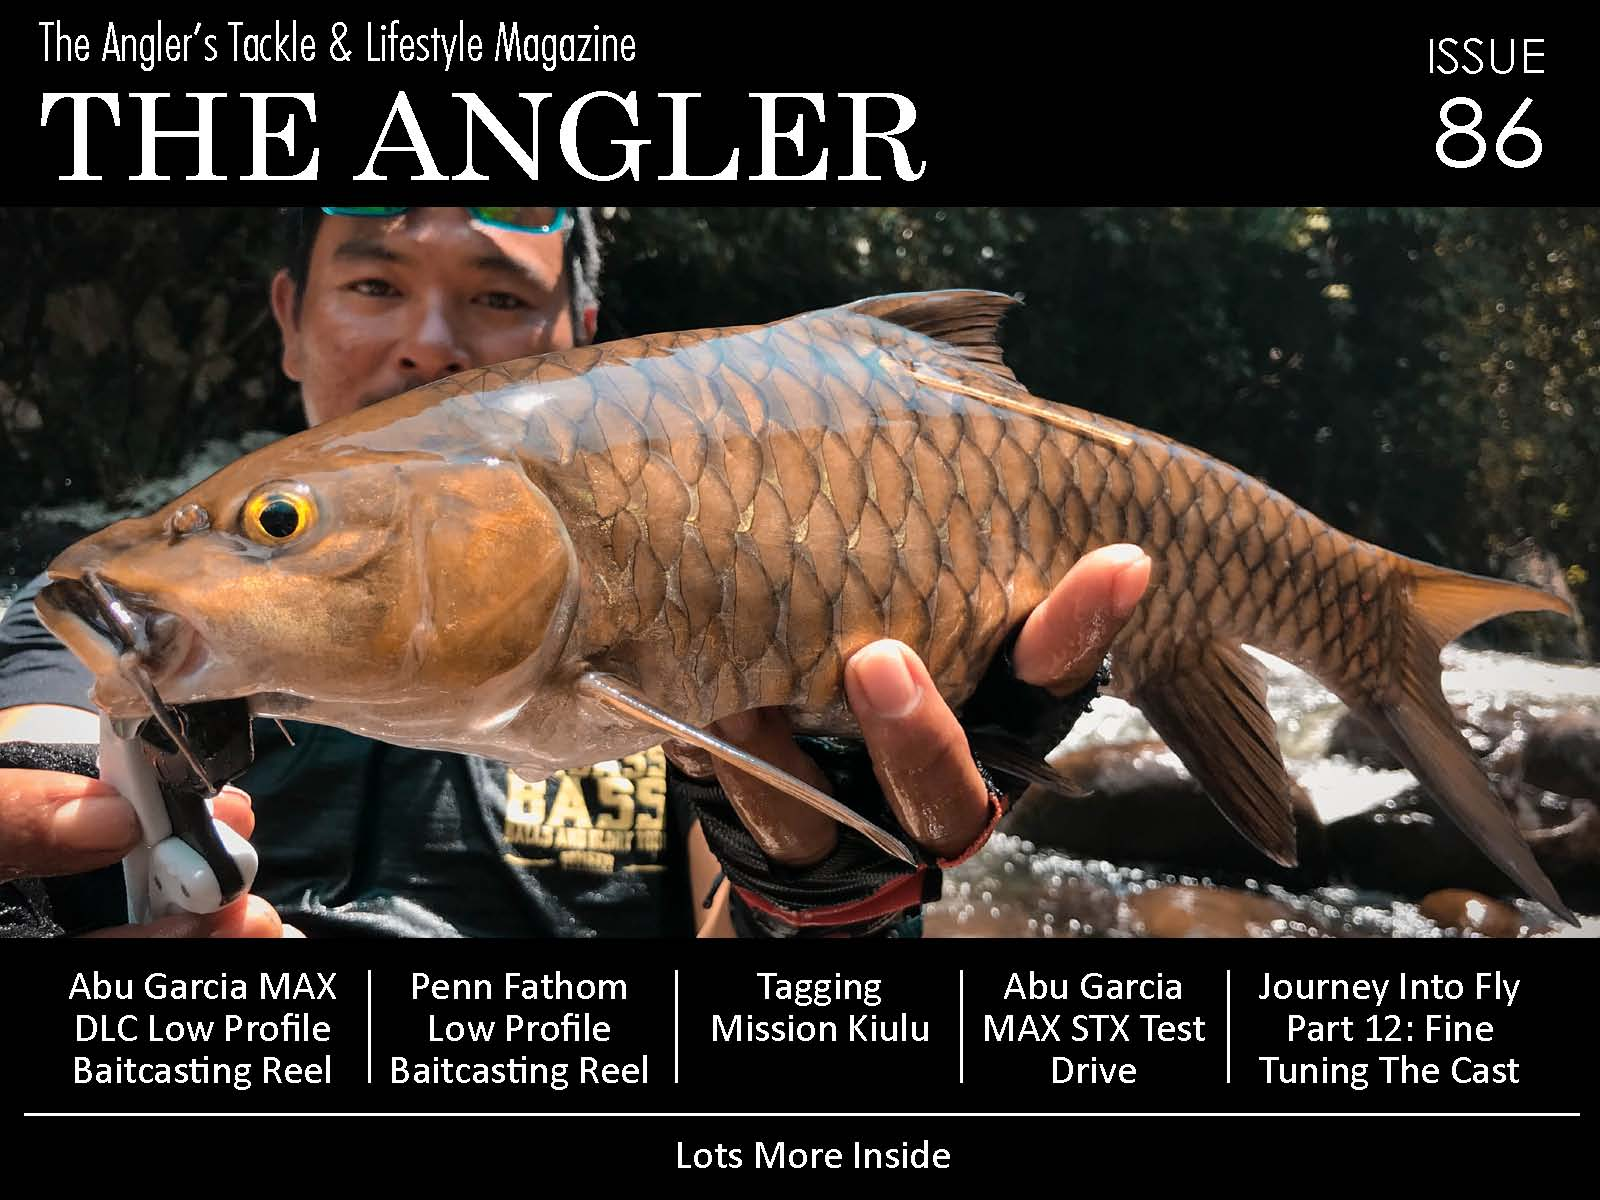 the angler magazine, the angler mag, the angler, the angler asia, The Asian Angler, Asian Angler, angling magazine, fishing magazines malaysia, malaysia fishing magazine